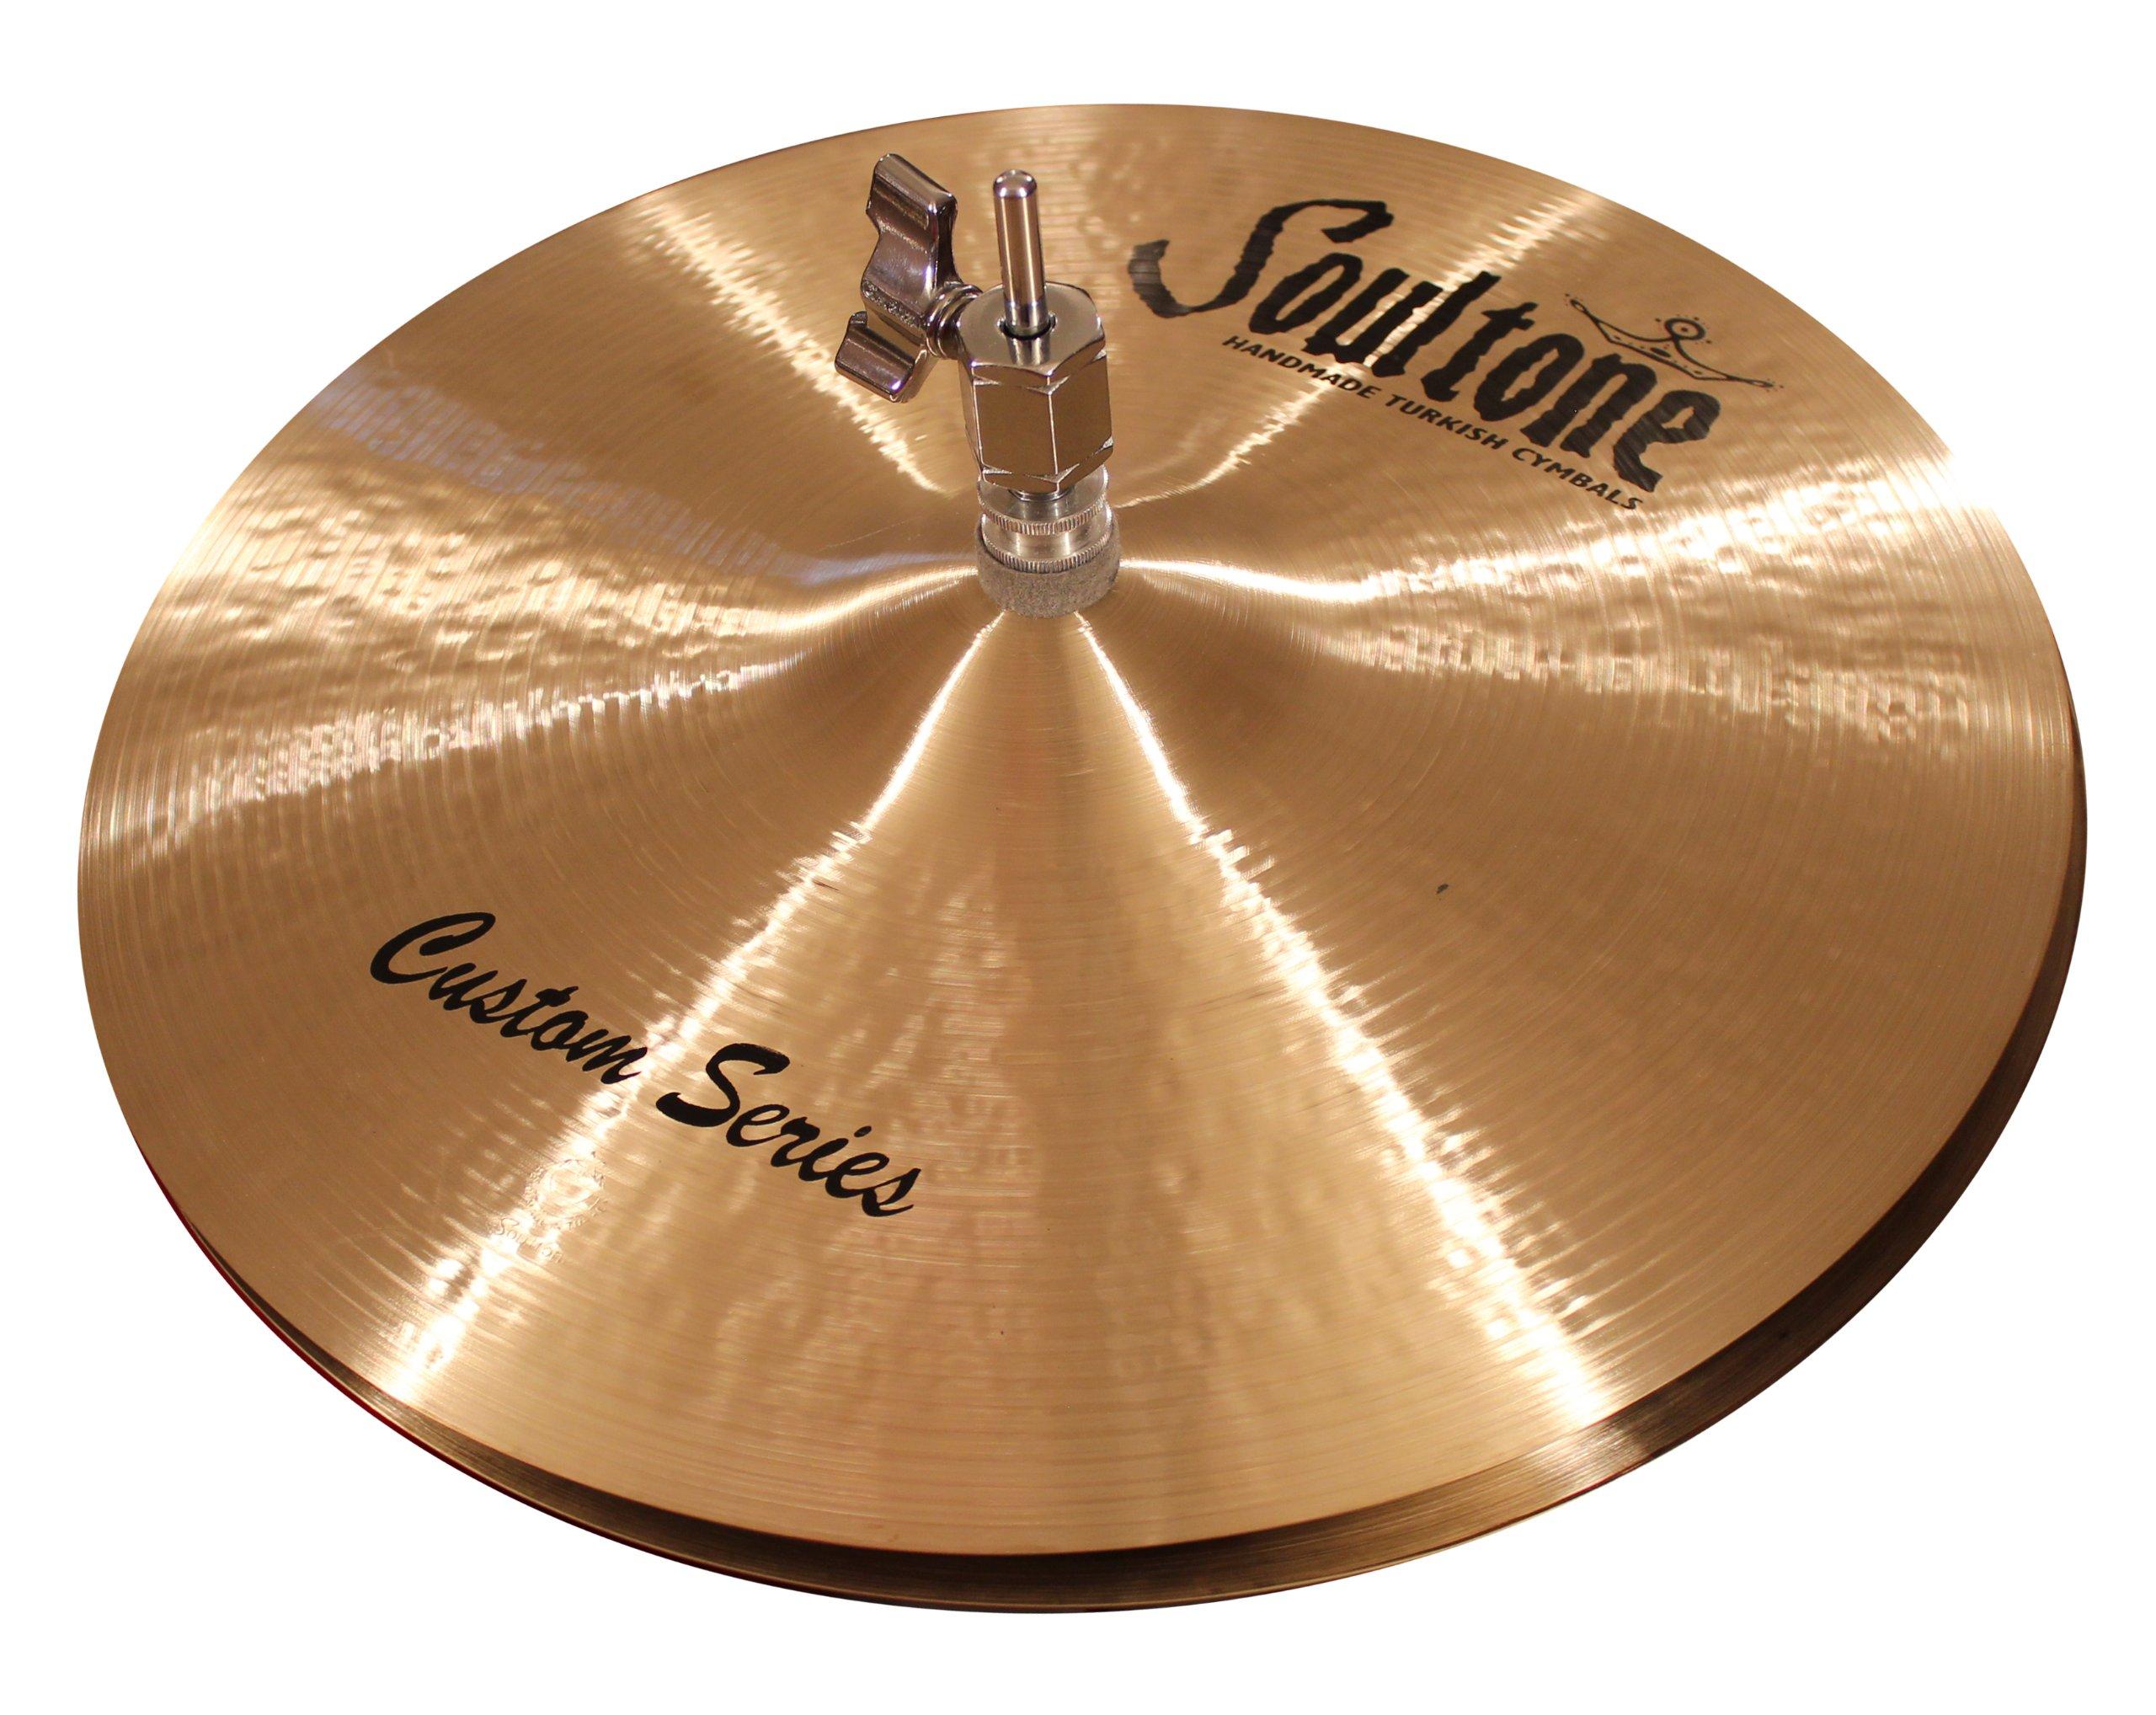 Soultone Cymbals CST-HHTT10-10'' Custom Hi Hat Top Only by Soultone Cymbals